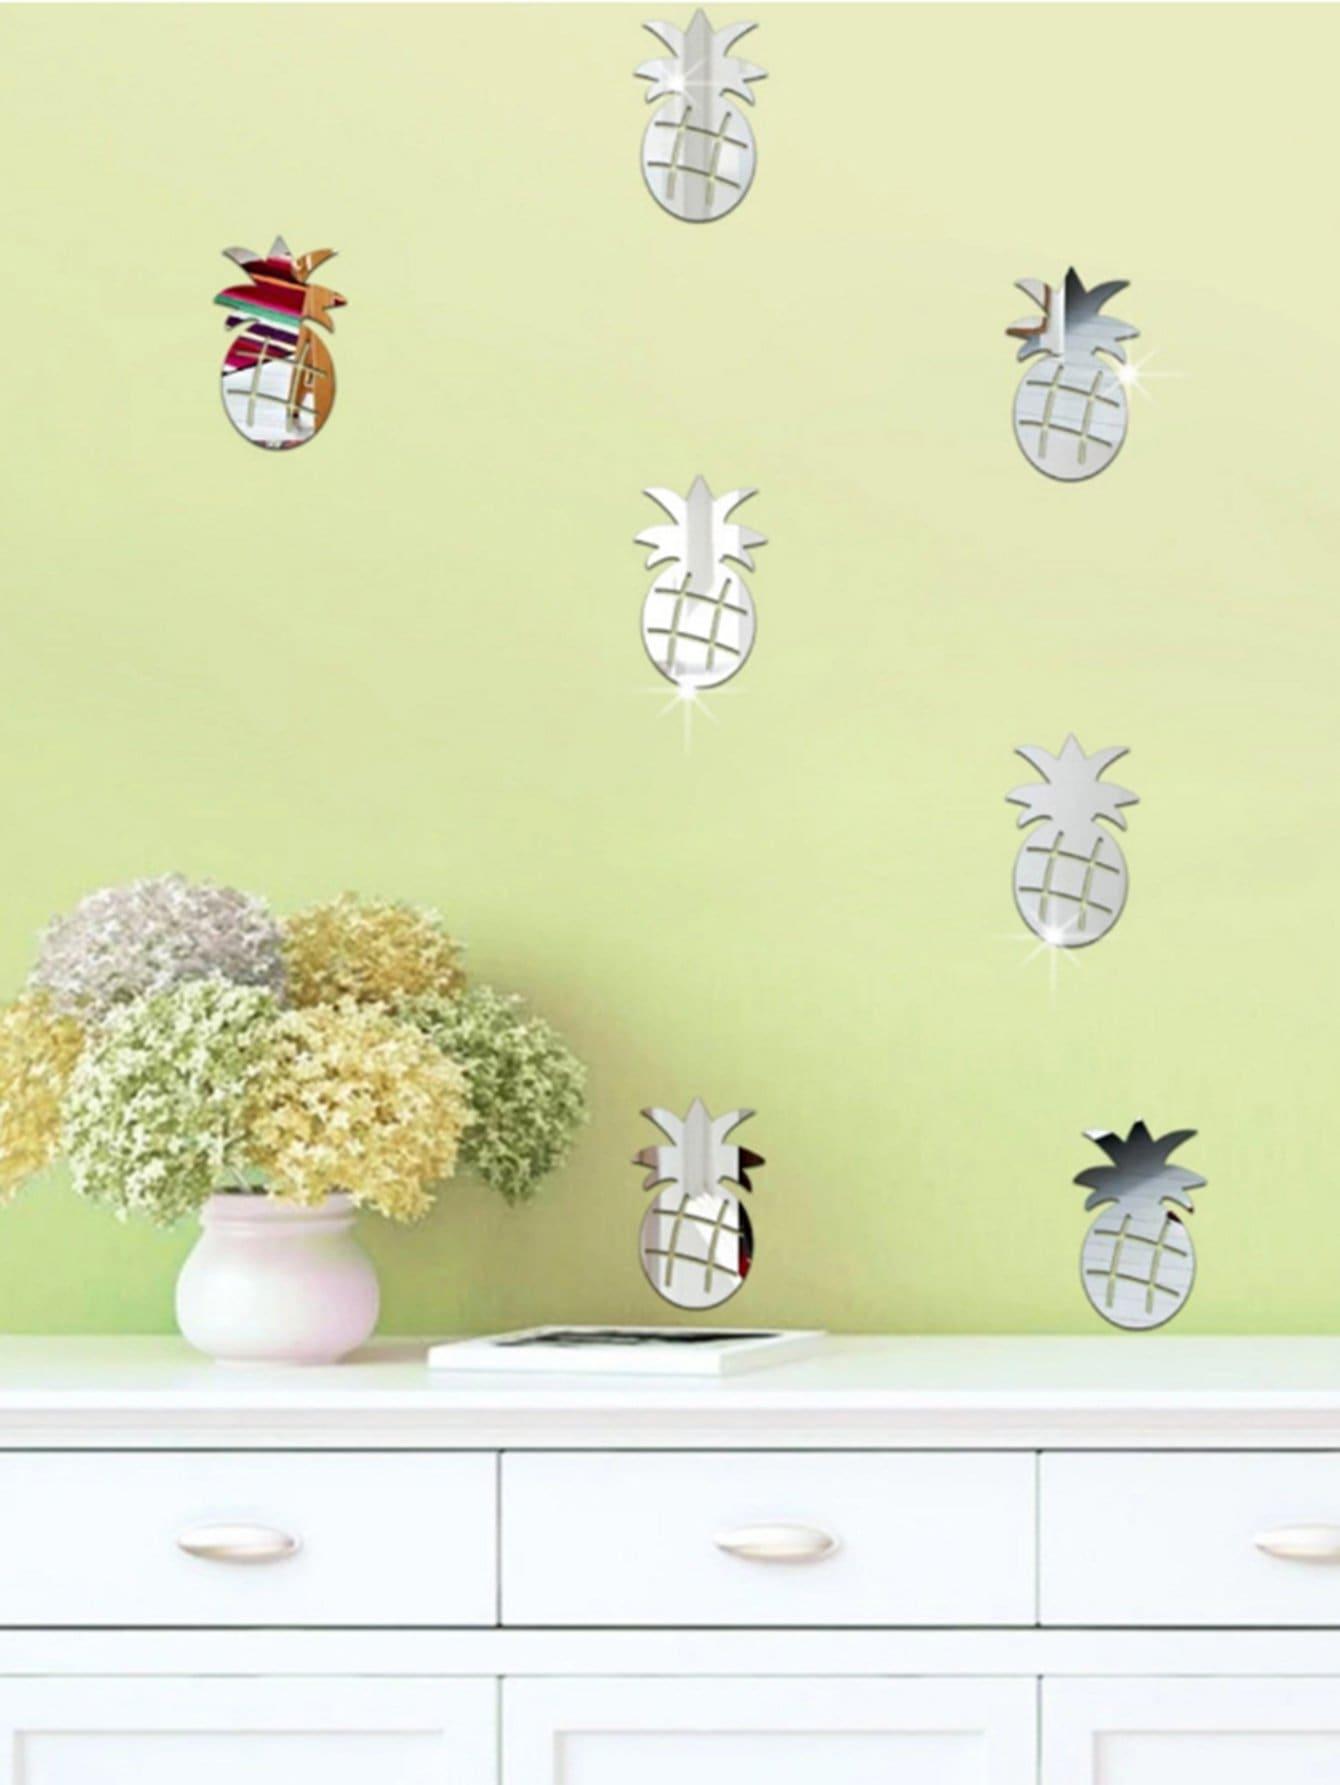 Pineapple Mirror Wall Sticker Set 24pcs